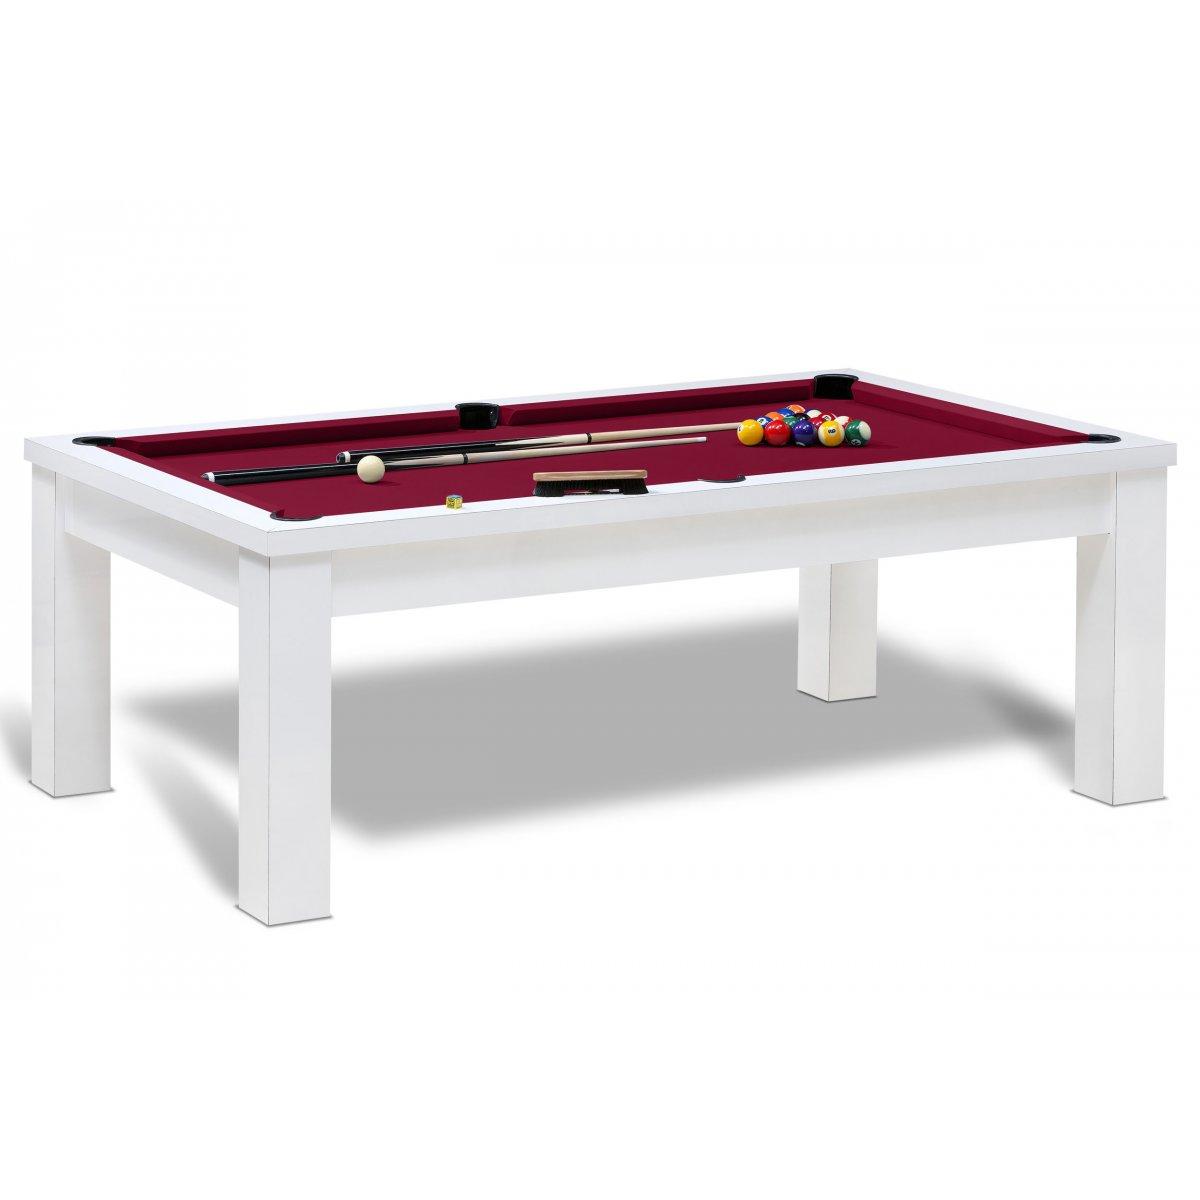 billard am ricain et billard table pour jeux americain us. Black Bedroom Furniture Sets. Home Design Ideas